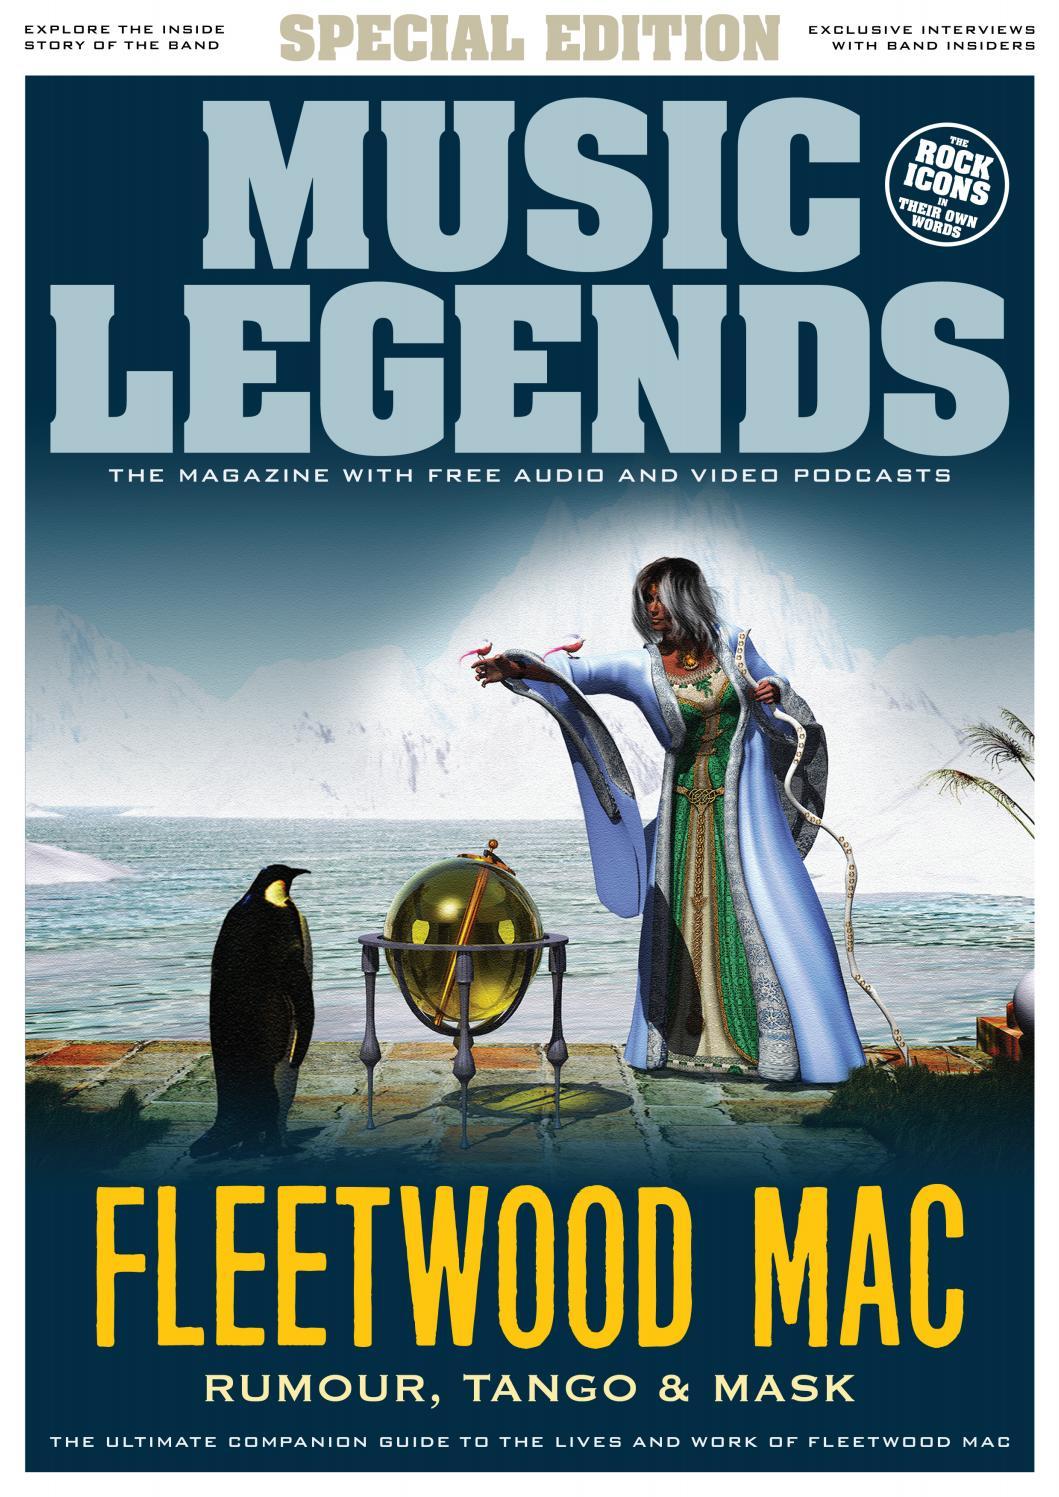 Music Legends – Fleetwood Mac Special Edition by codarecordsltd - issuu